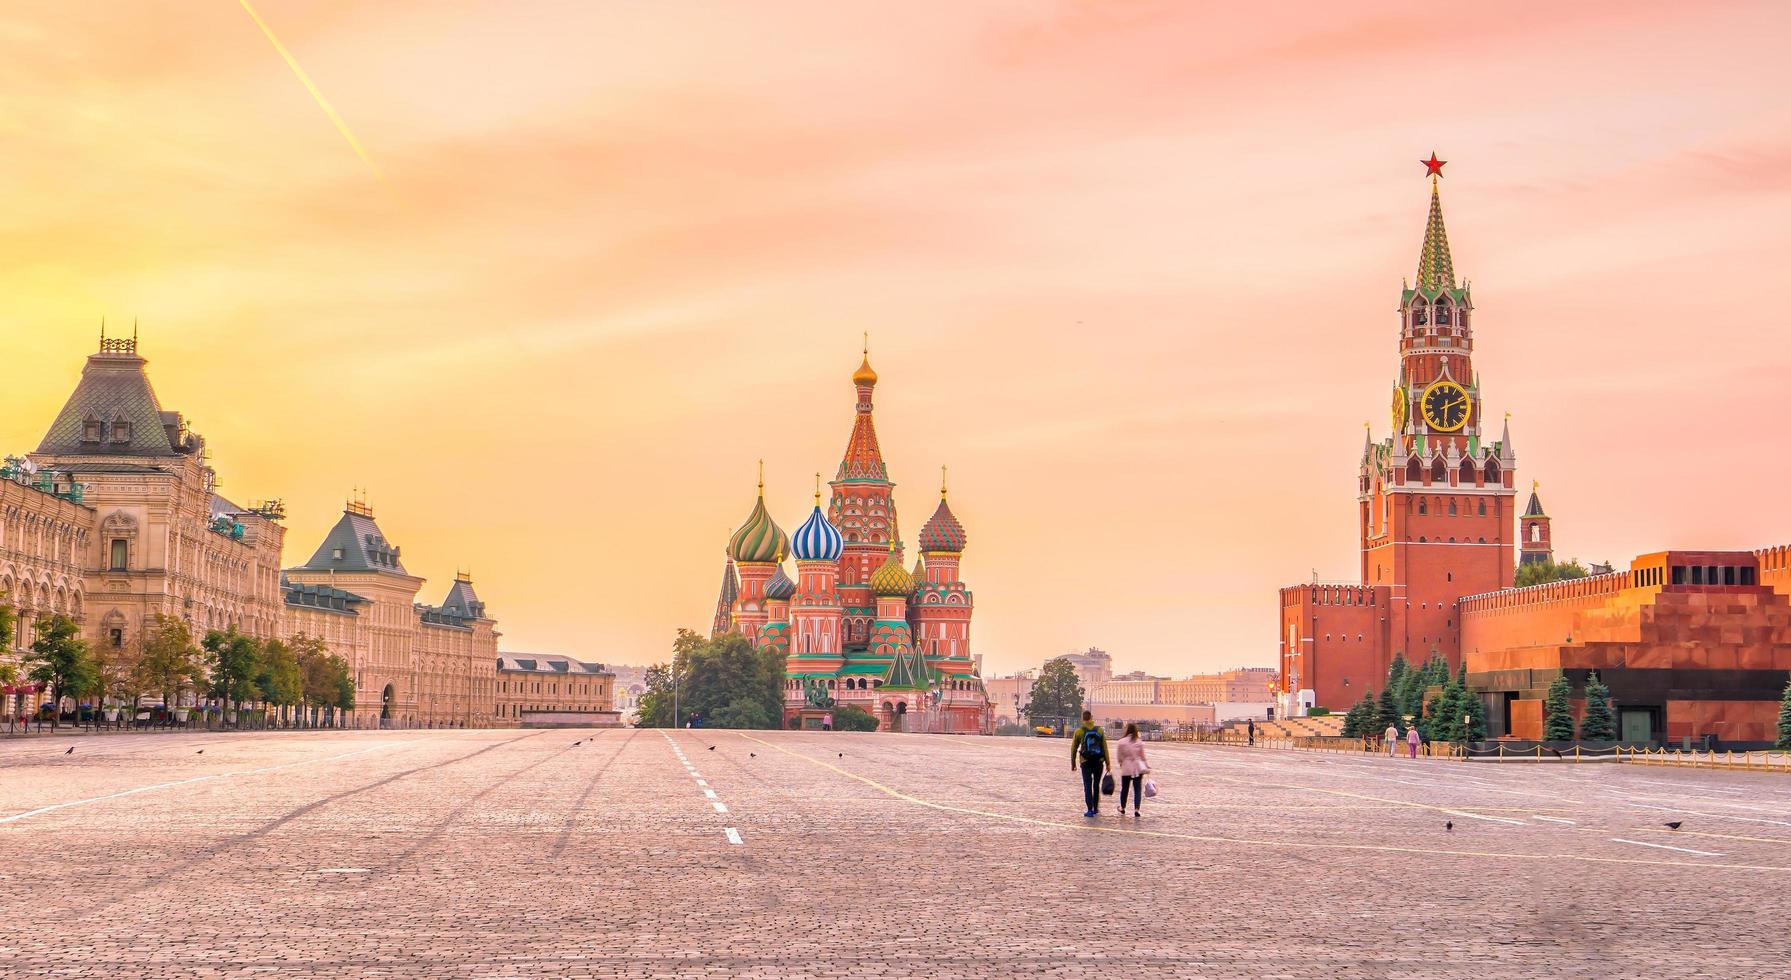 Basilikum Kathedrale am roten Platz in Moskau foto